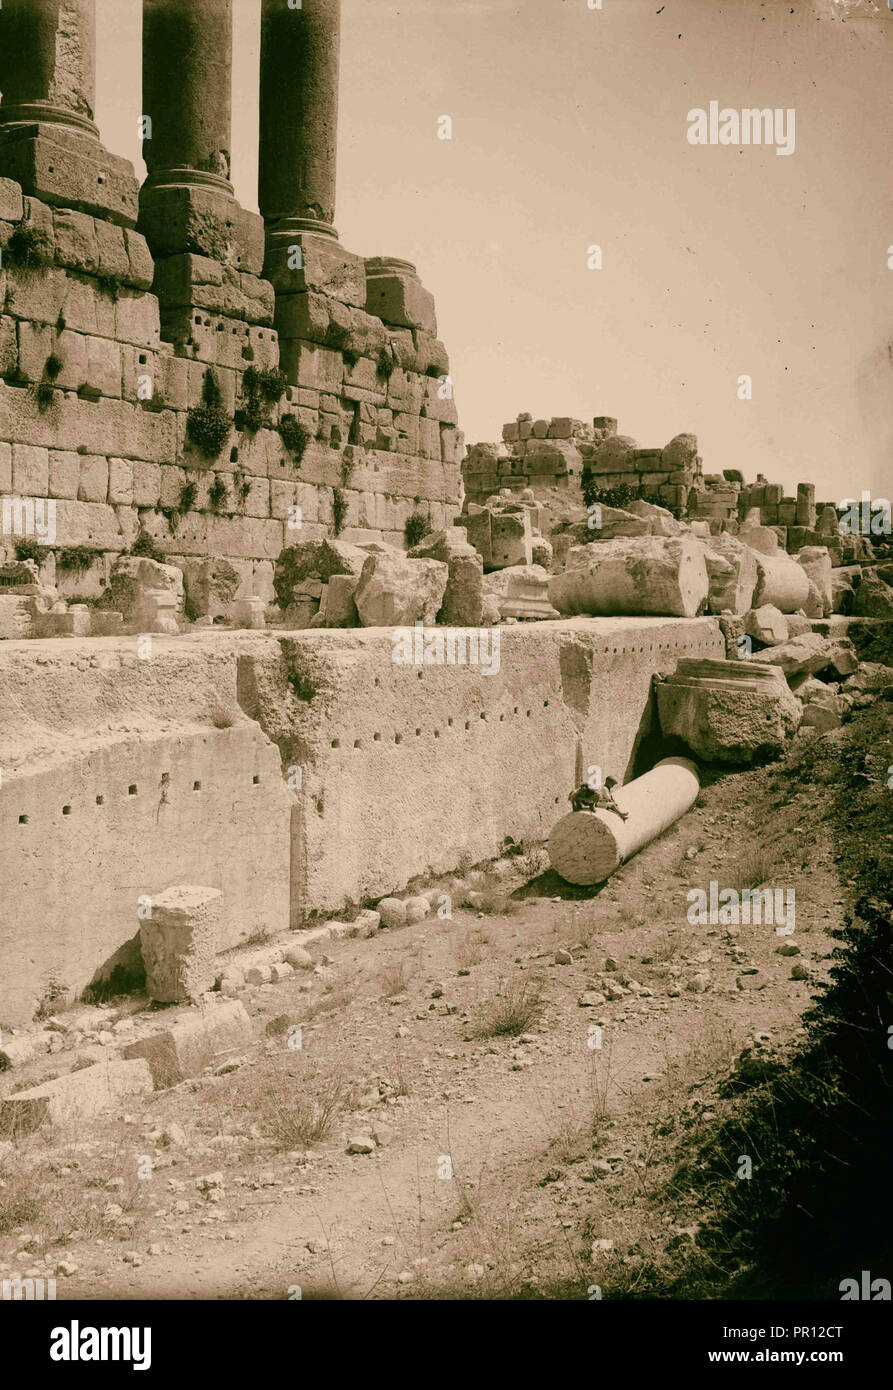 Baalbek. Temple of the sun. Immense stones in foundation of the great temple. 1900, Lebanon, Baʻlabakk, BaʻLabakk - Stock Image